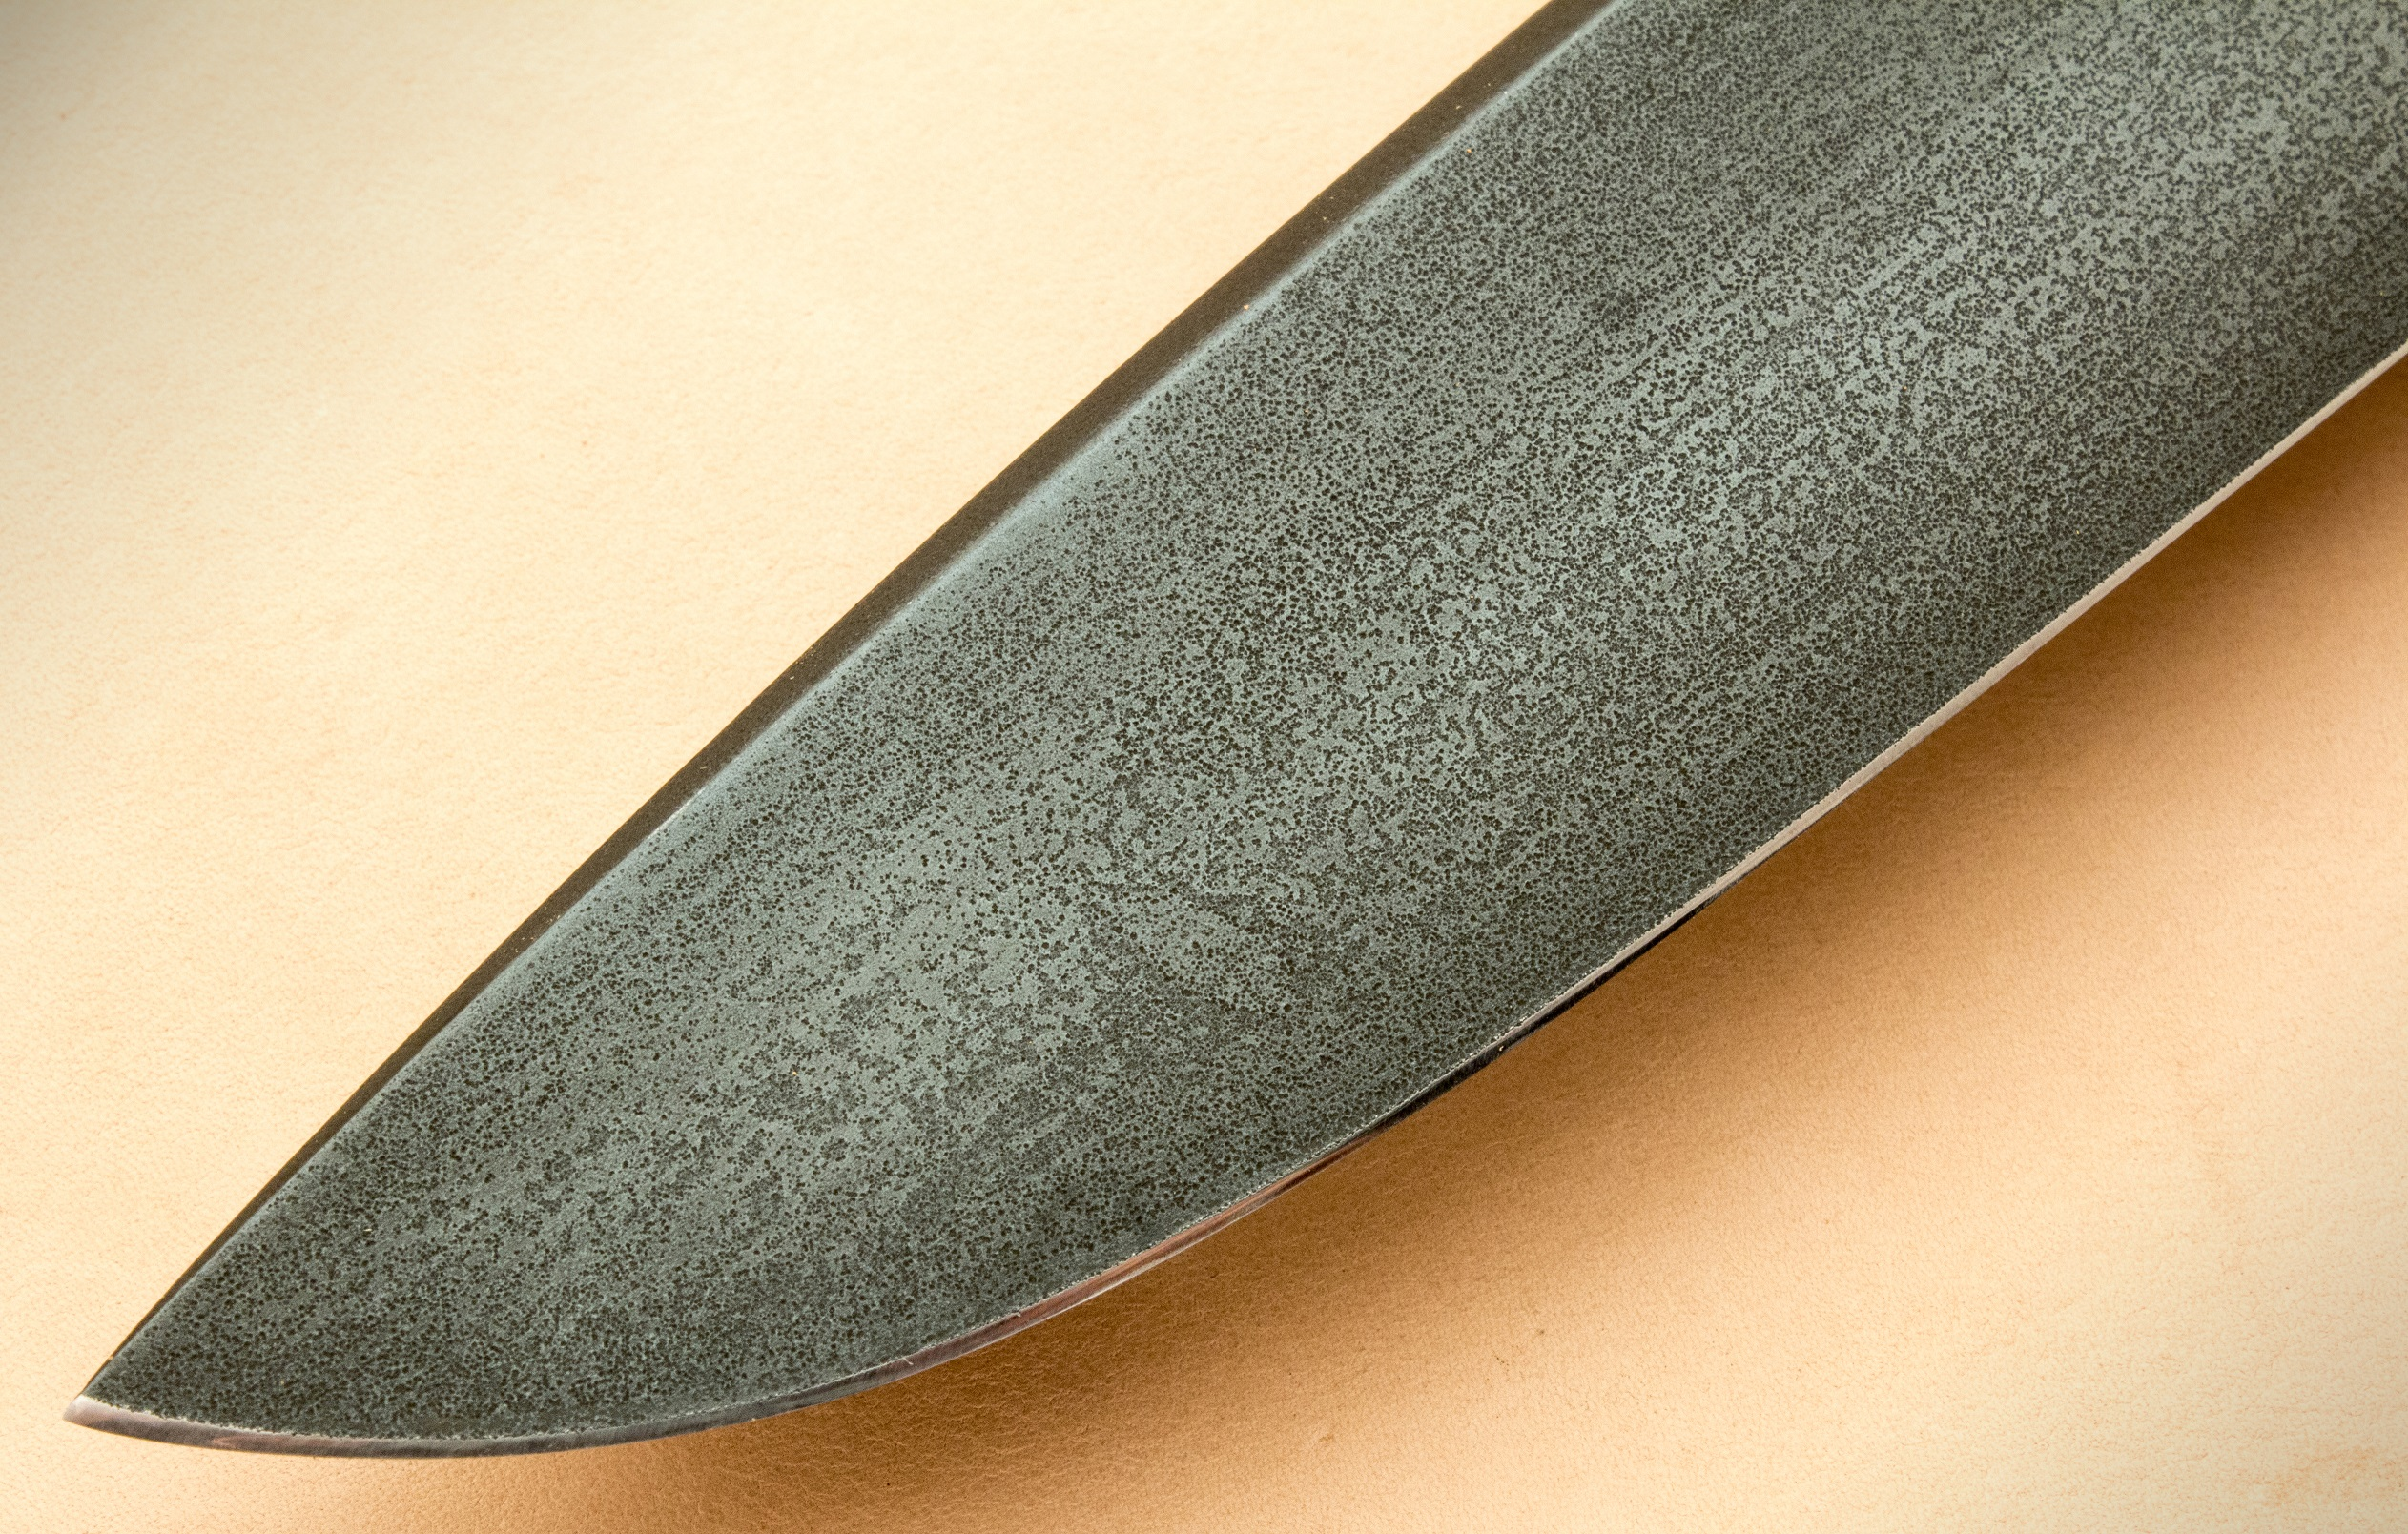 The Black Blade